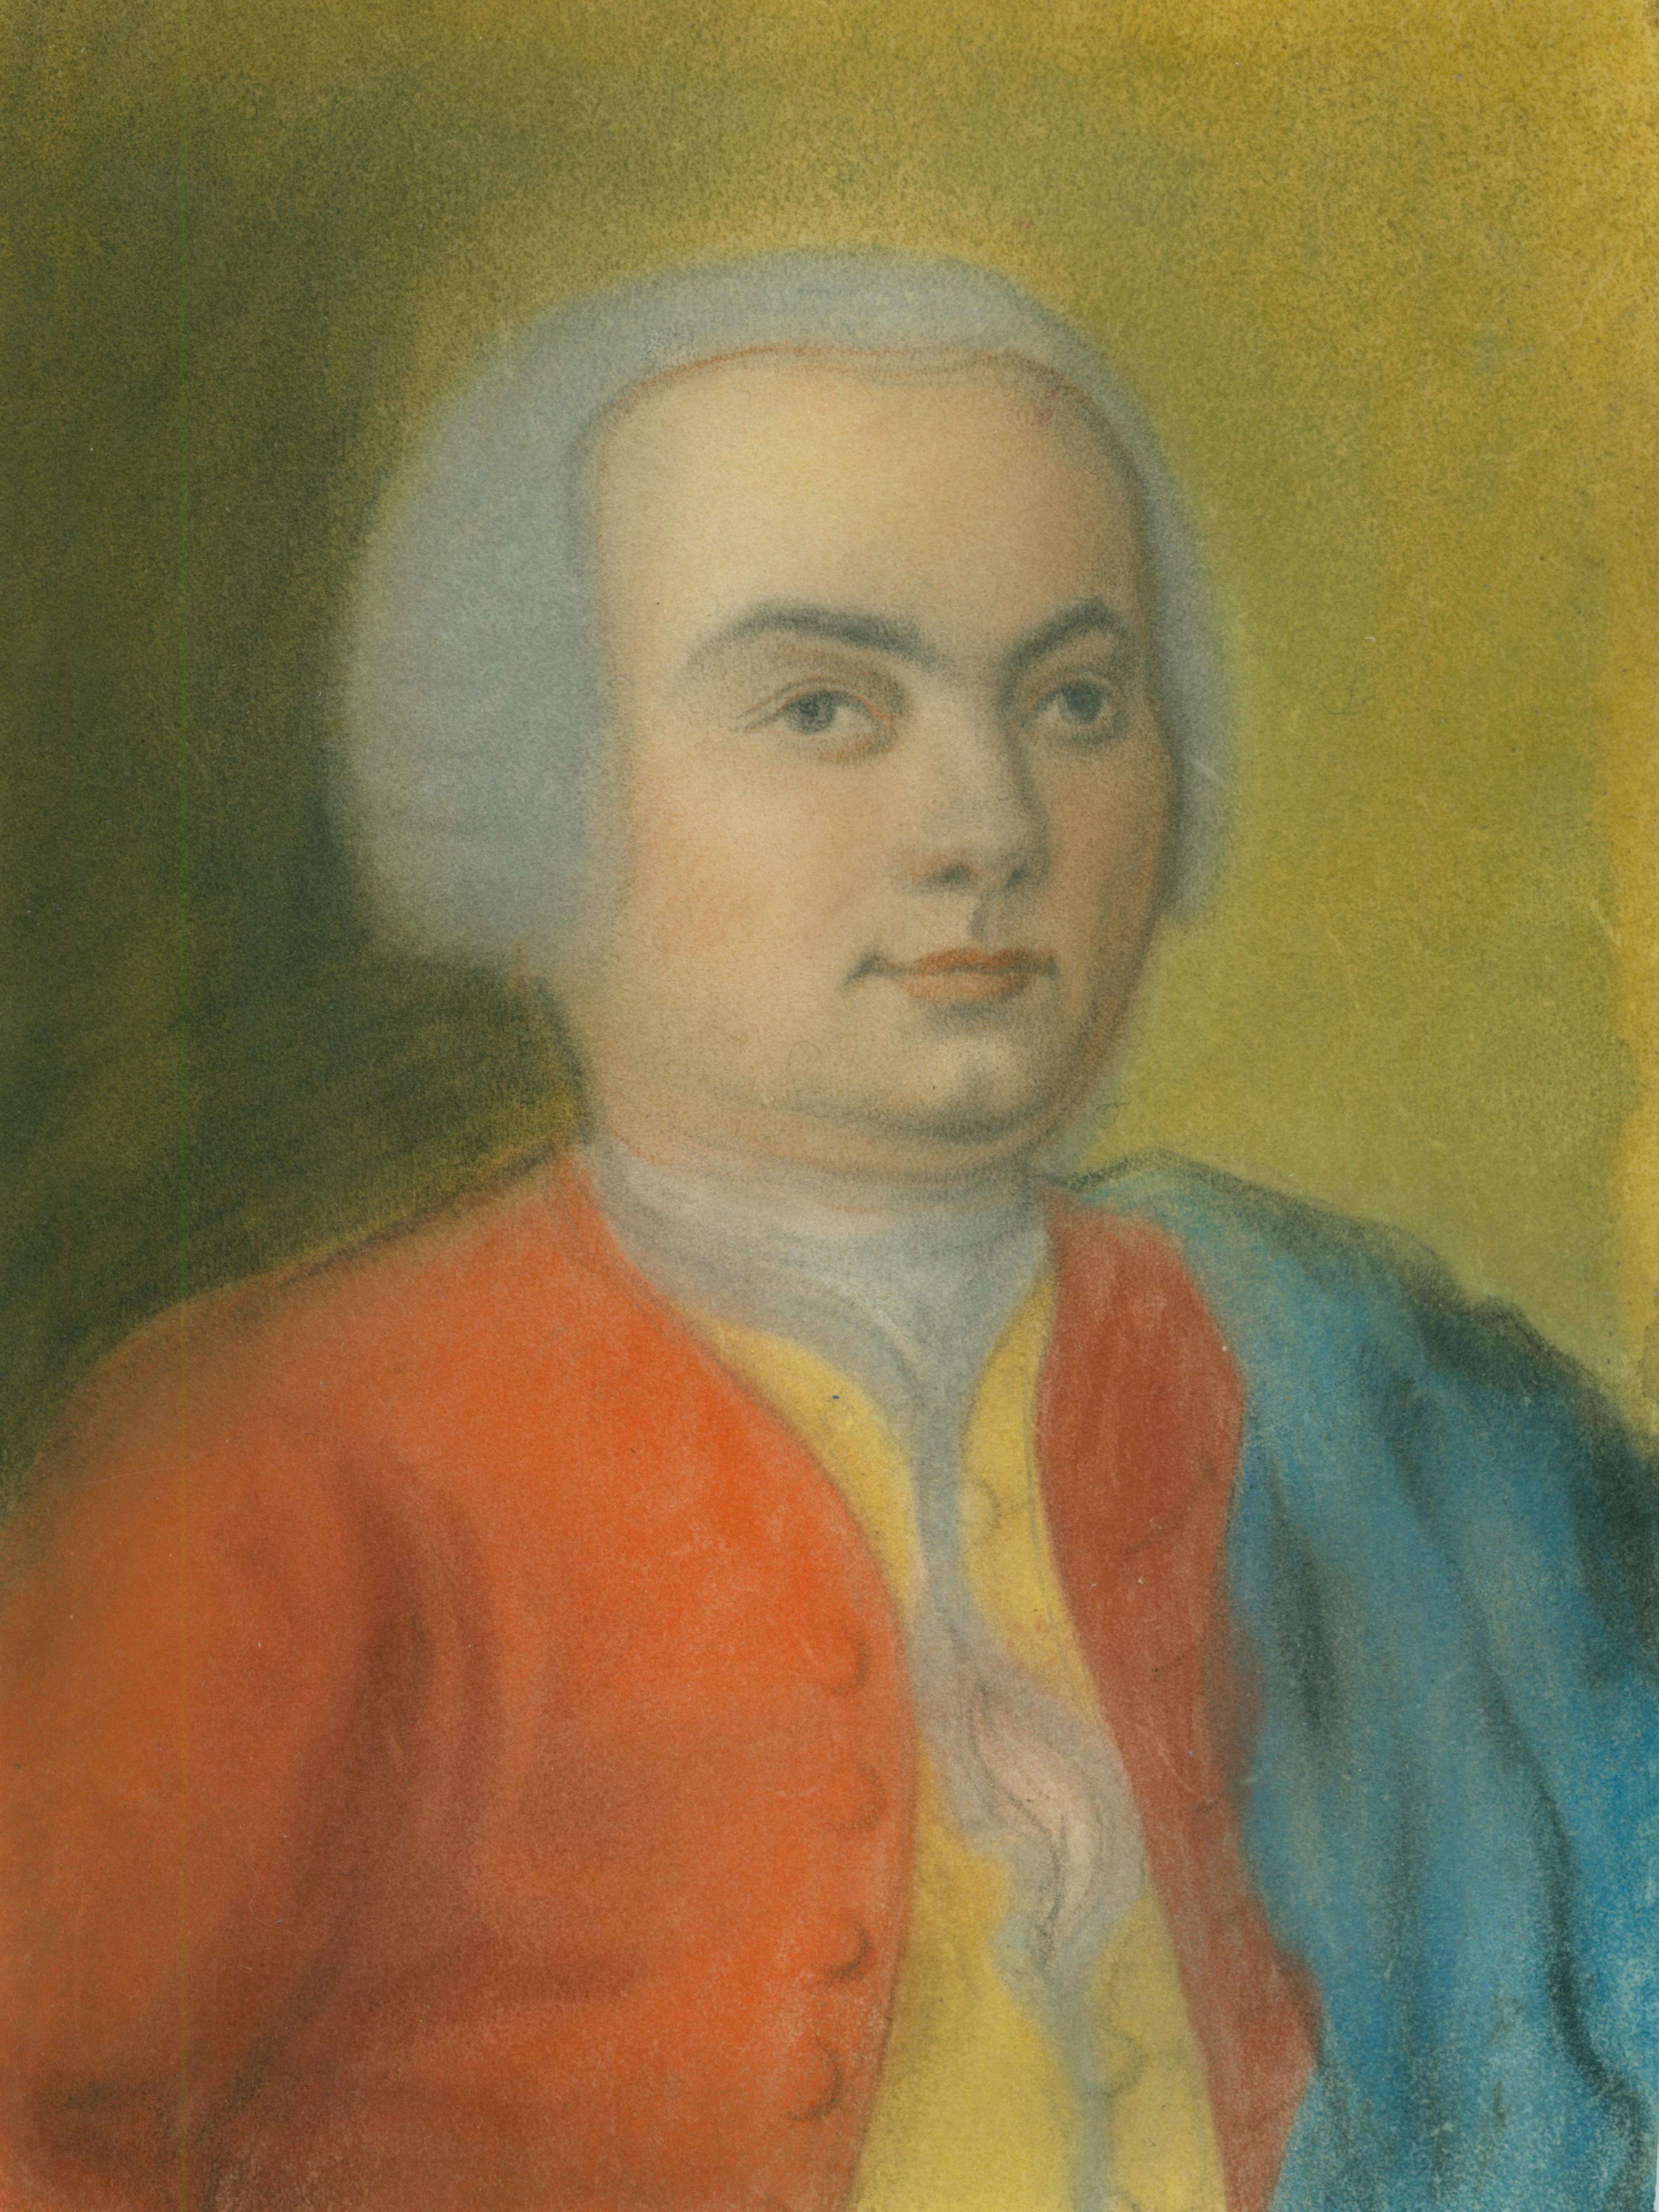 Georg Philipp Telemann Telemann - Joseph Haydn Haydn Virtuose Kammermusik